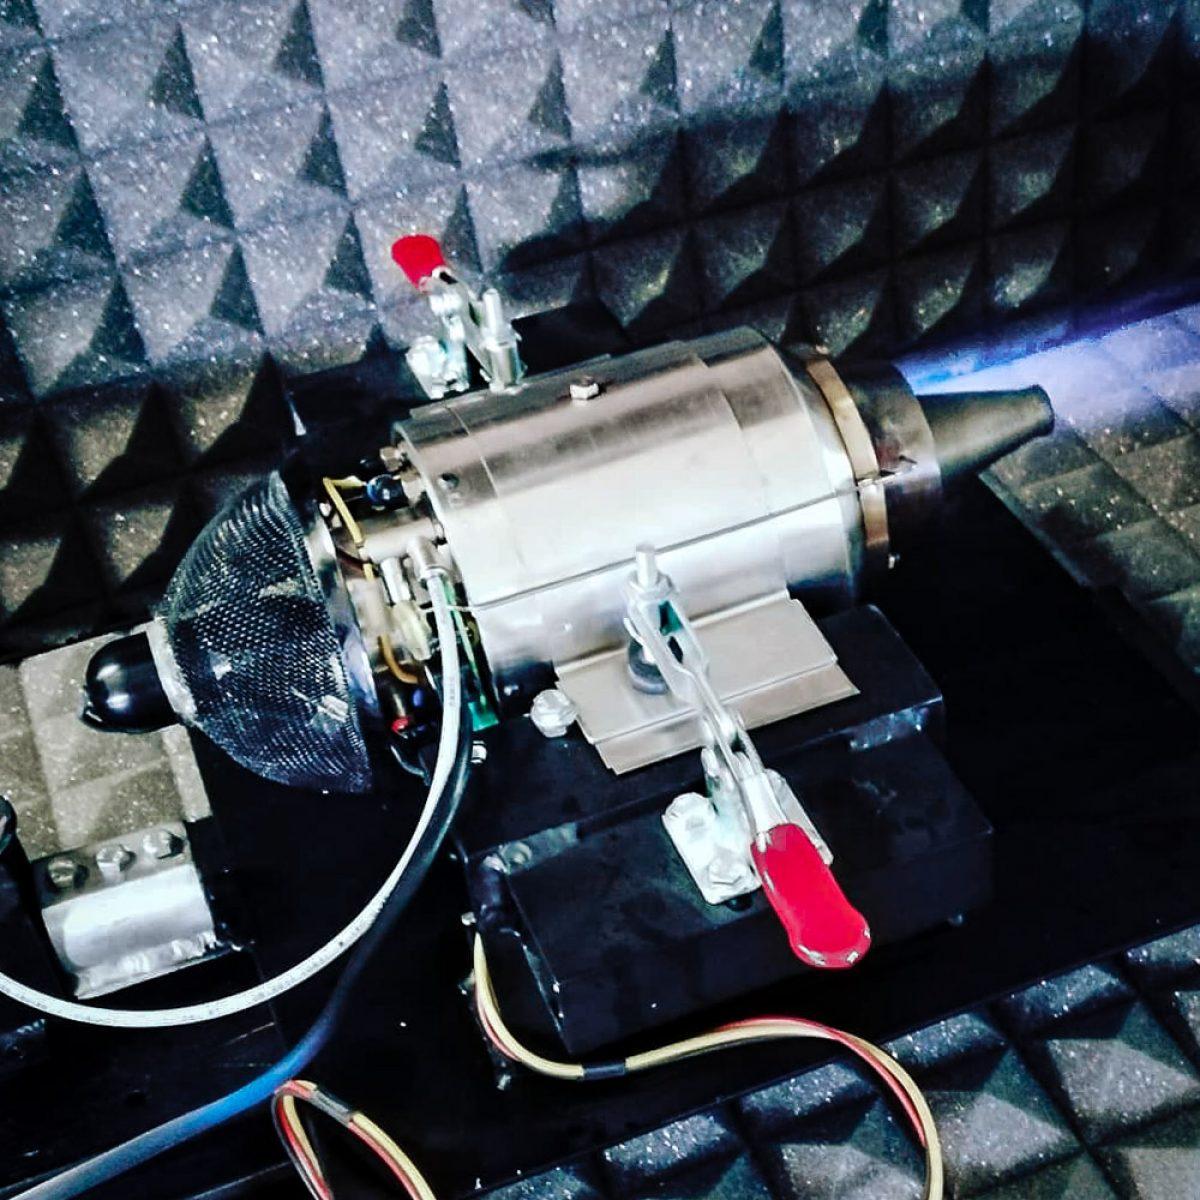 Frank-Turbinen Service |Modelbau Bernreiter